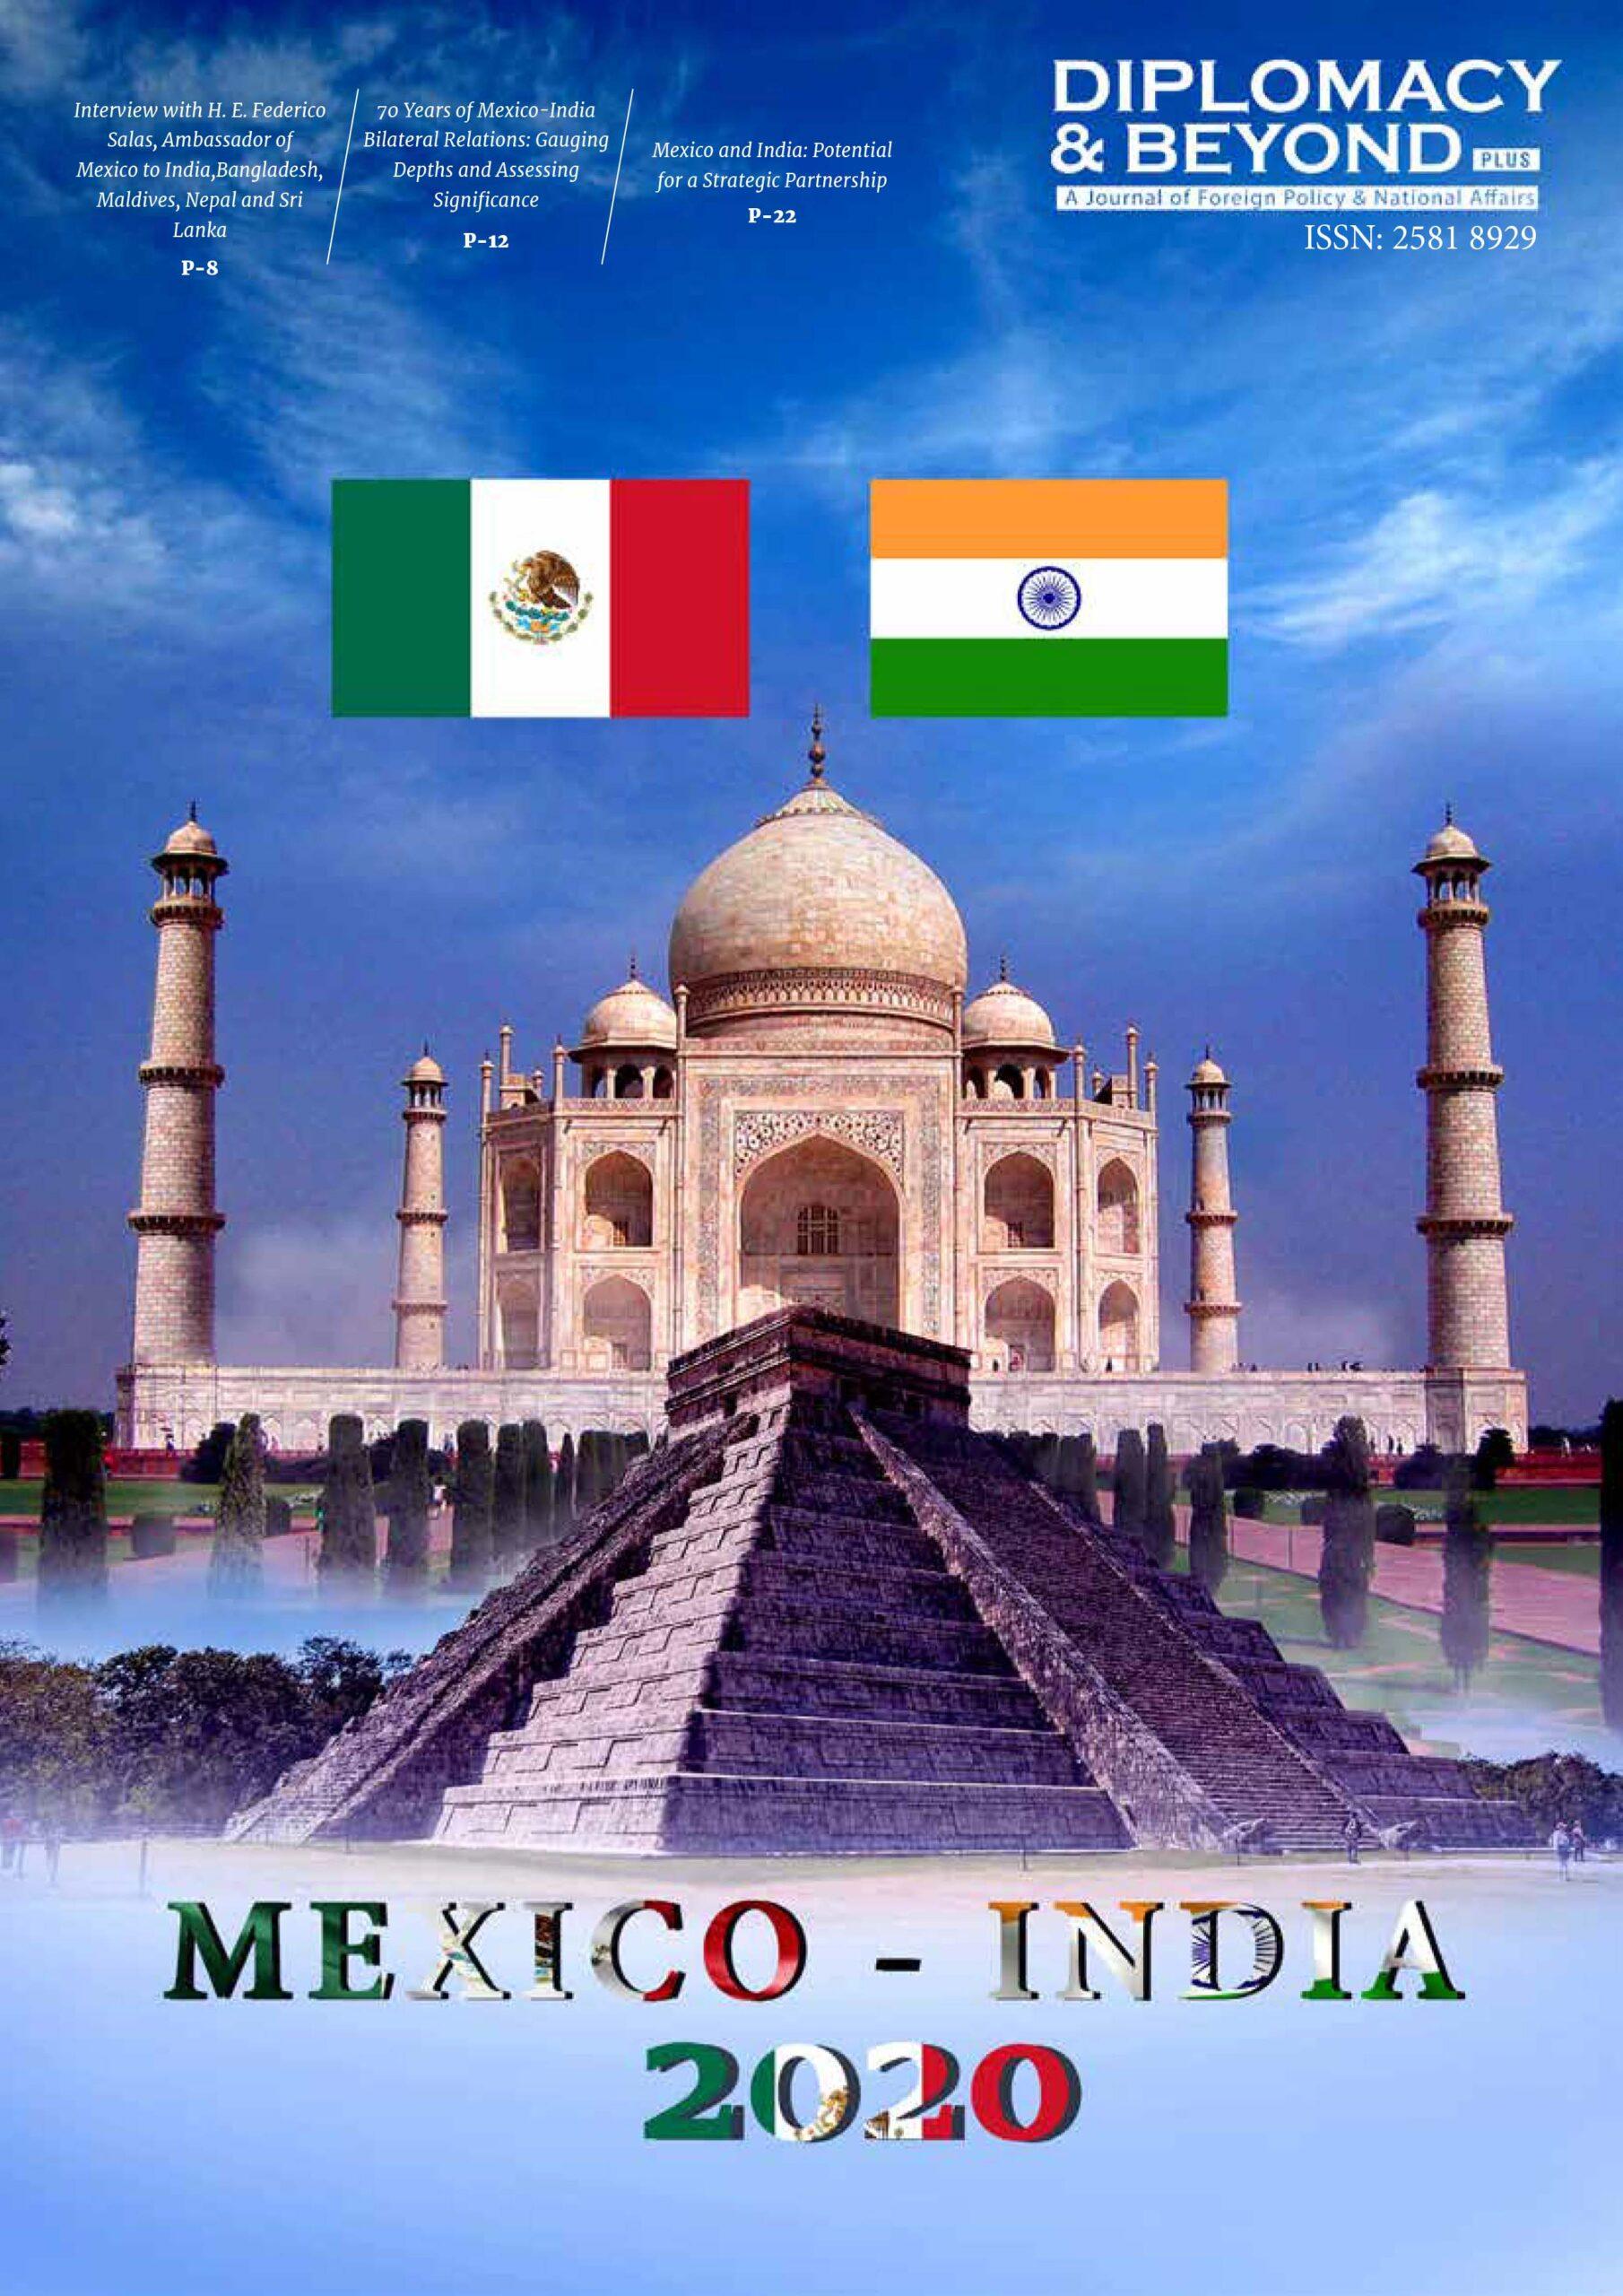 Mexico-India